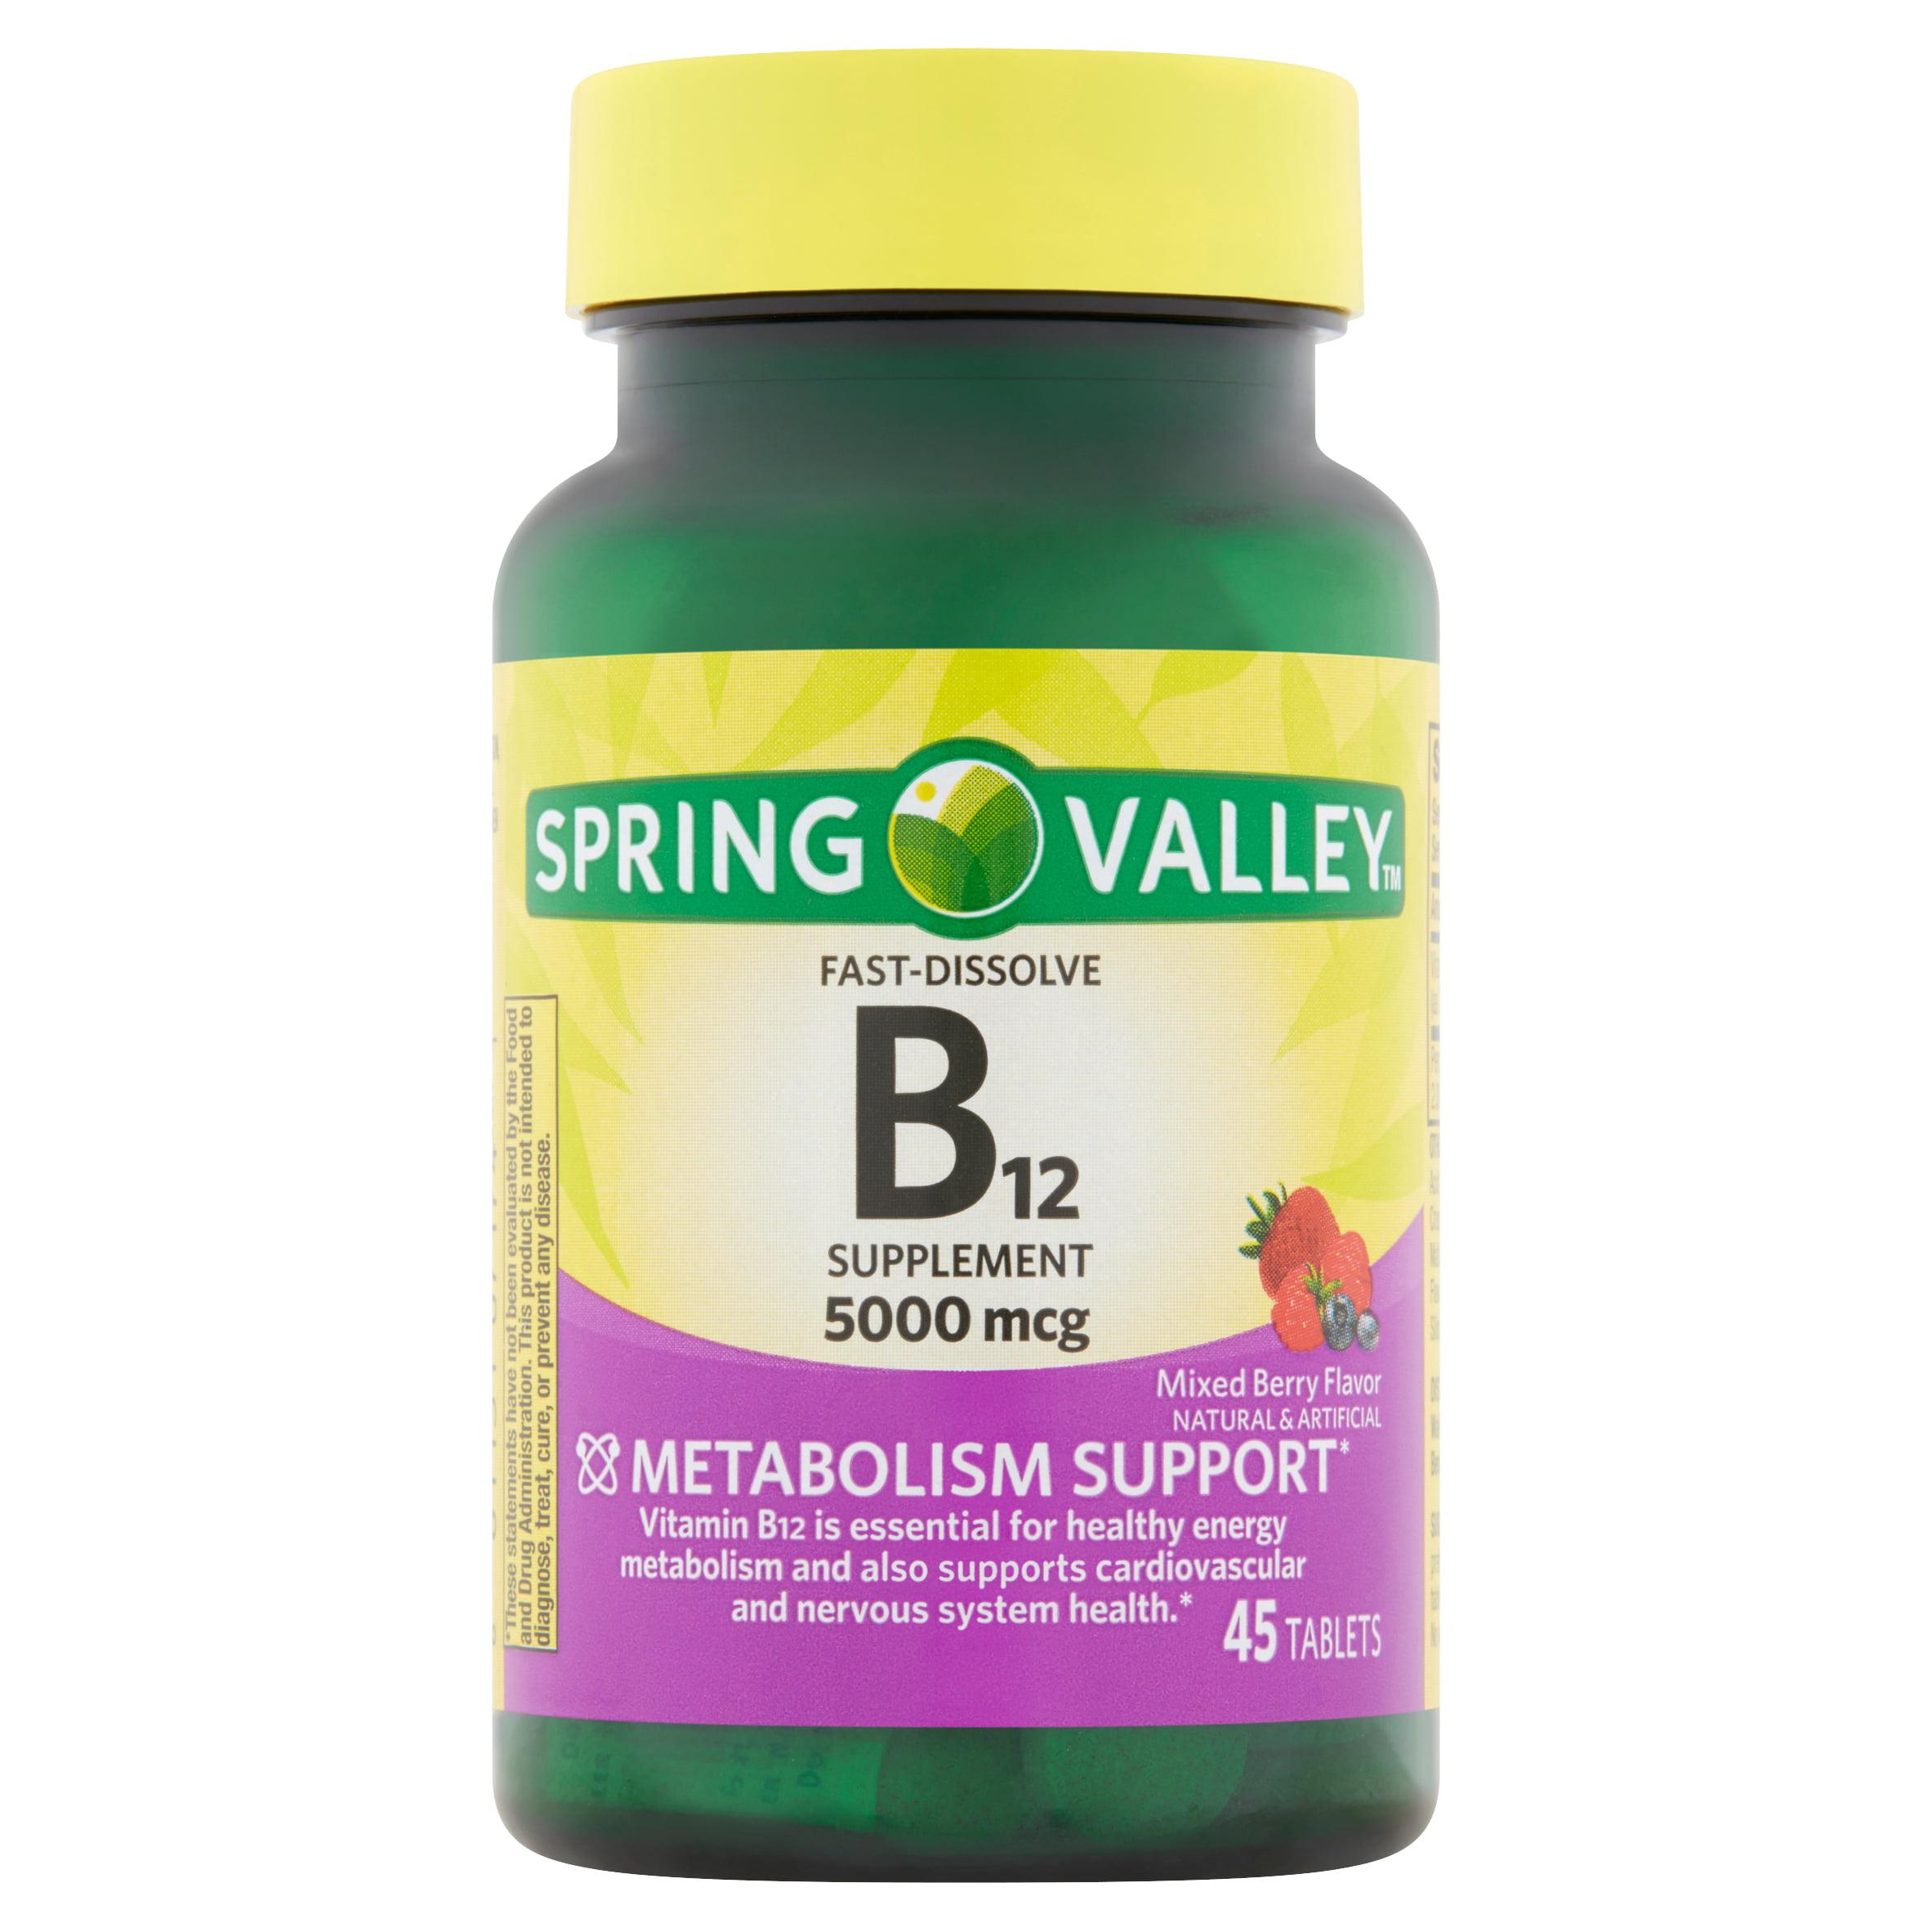 Spring Valley Vitamin B12 Fast-Dissolve